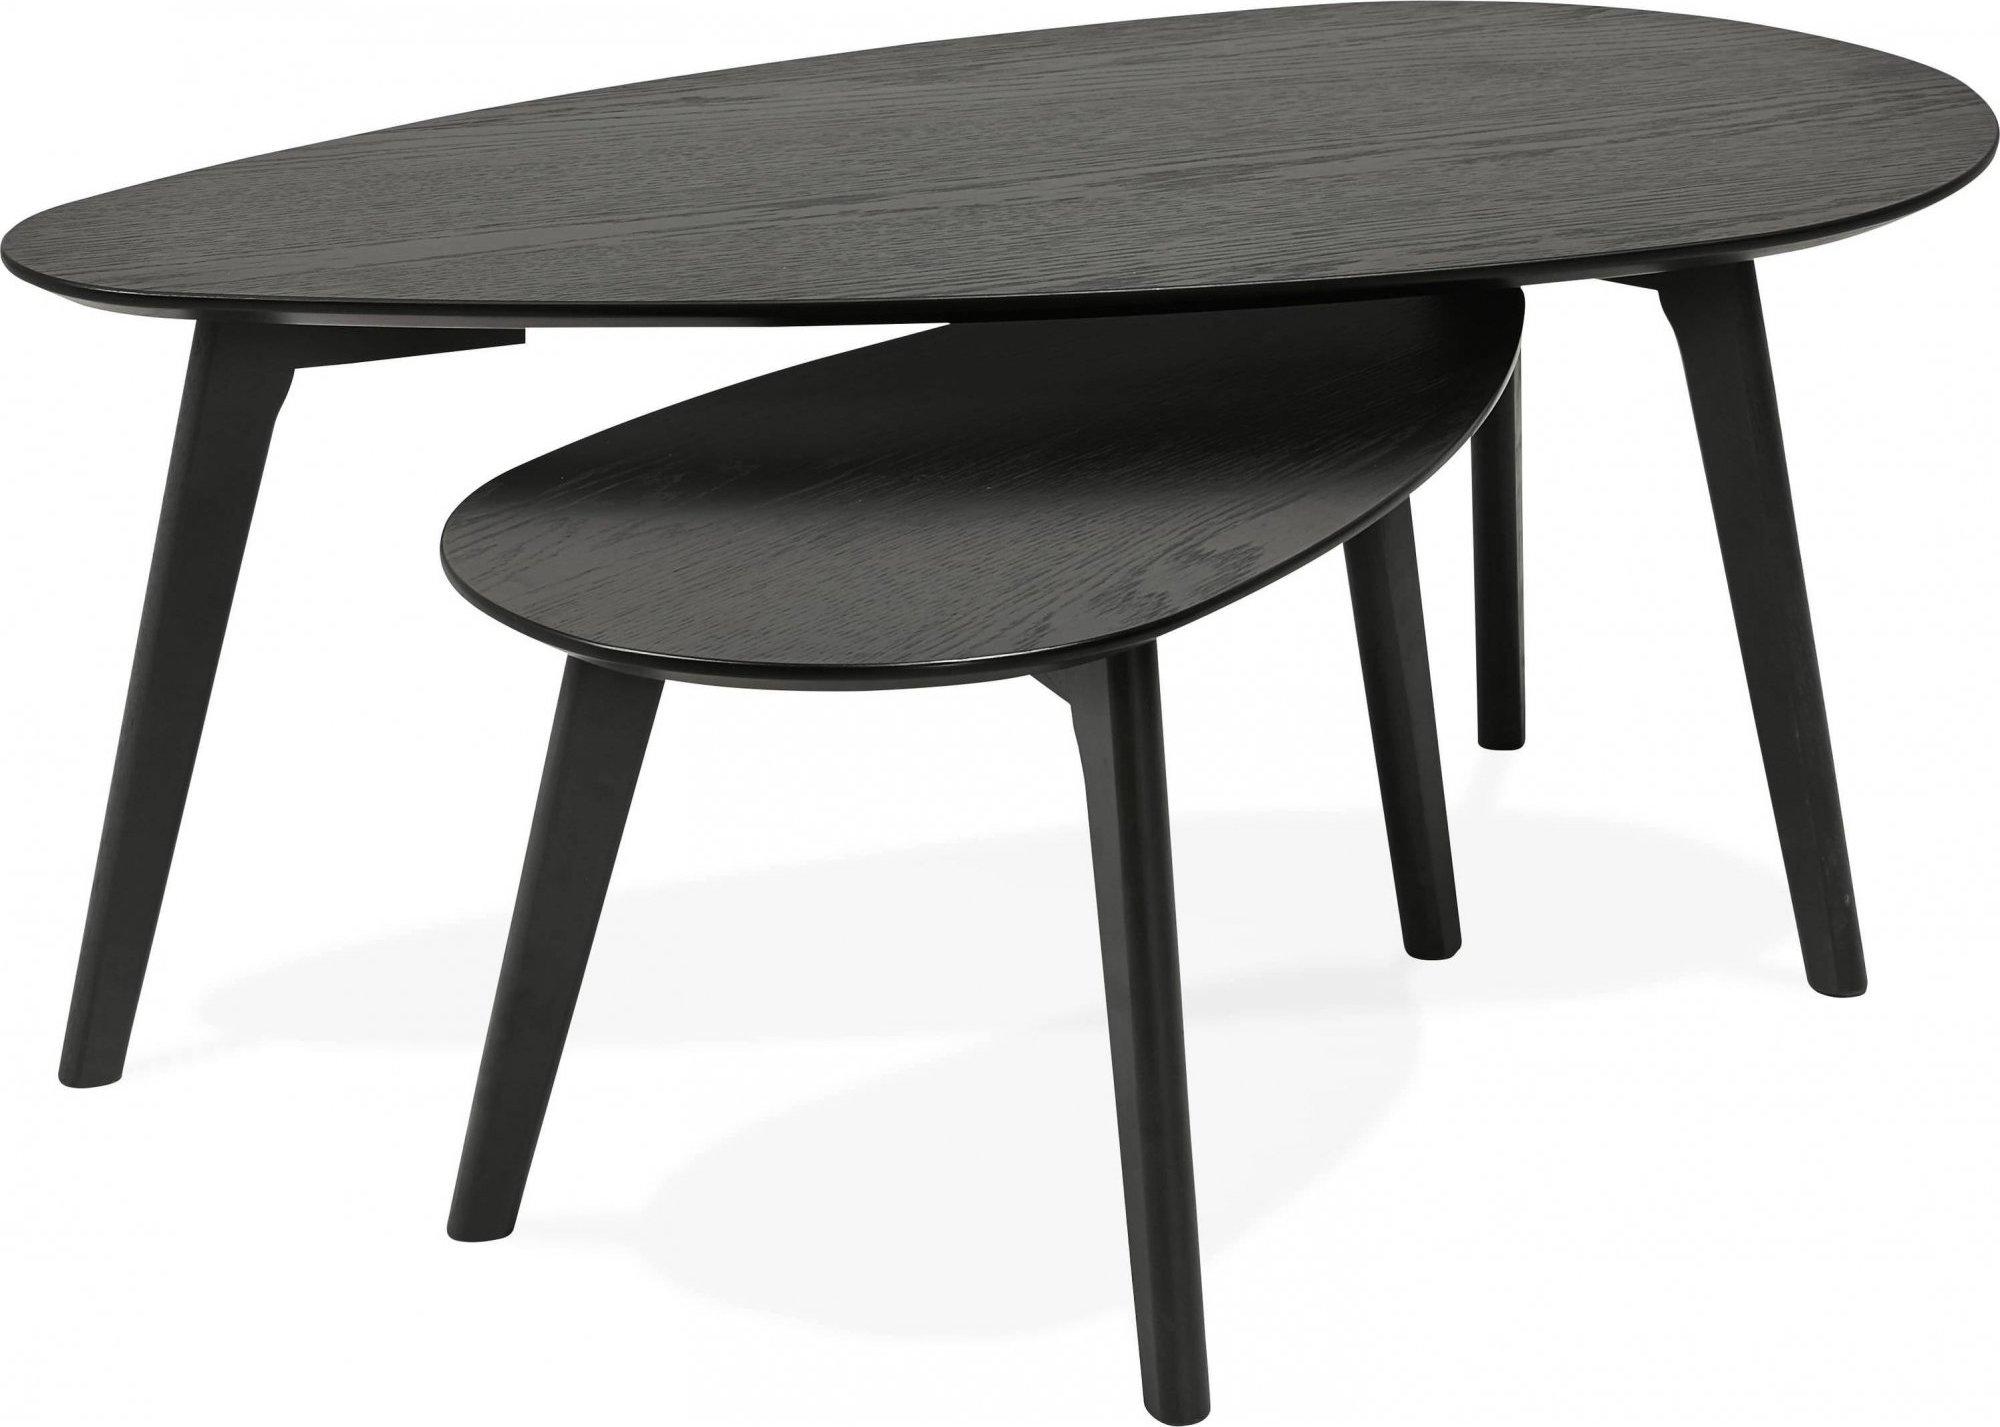 Table basse gigogne en chêne noir